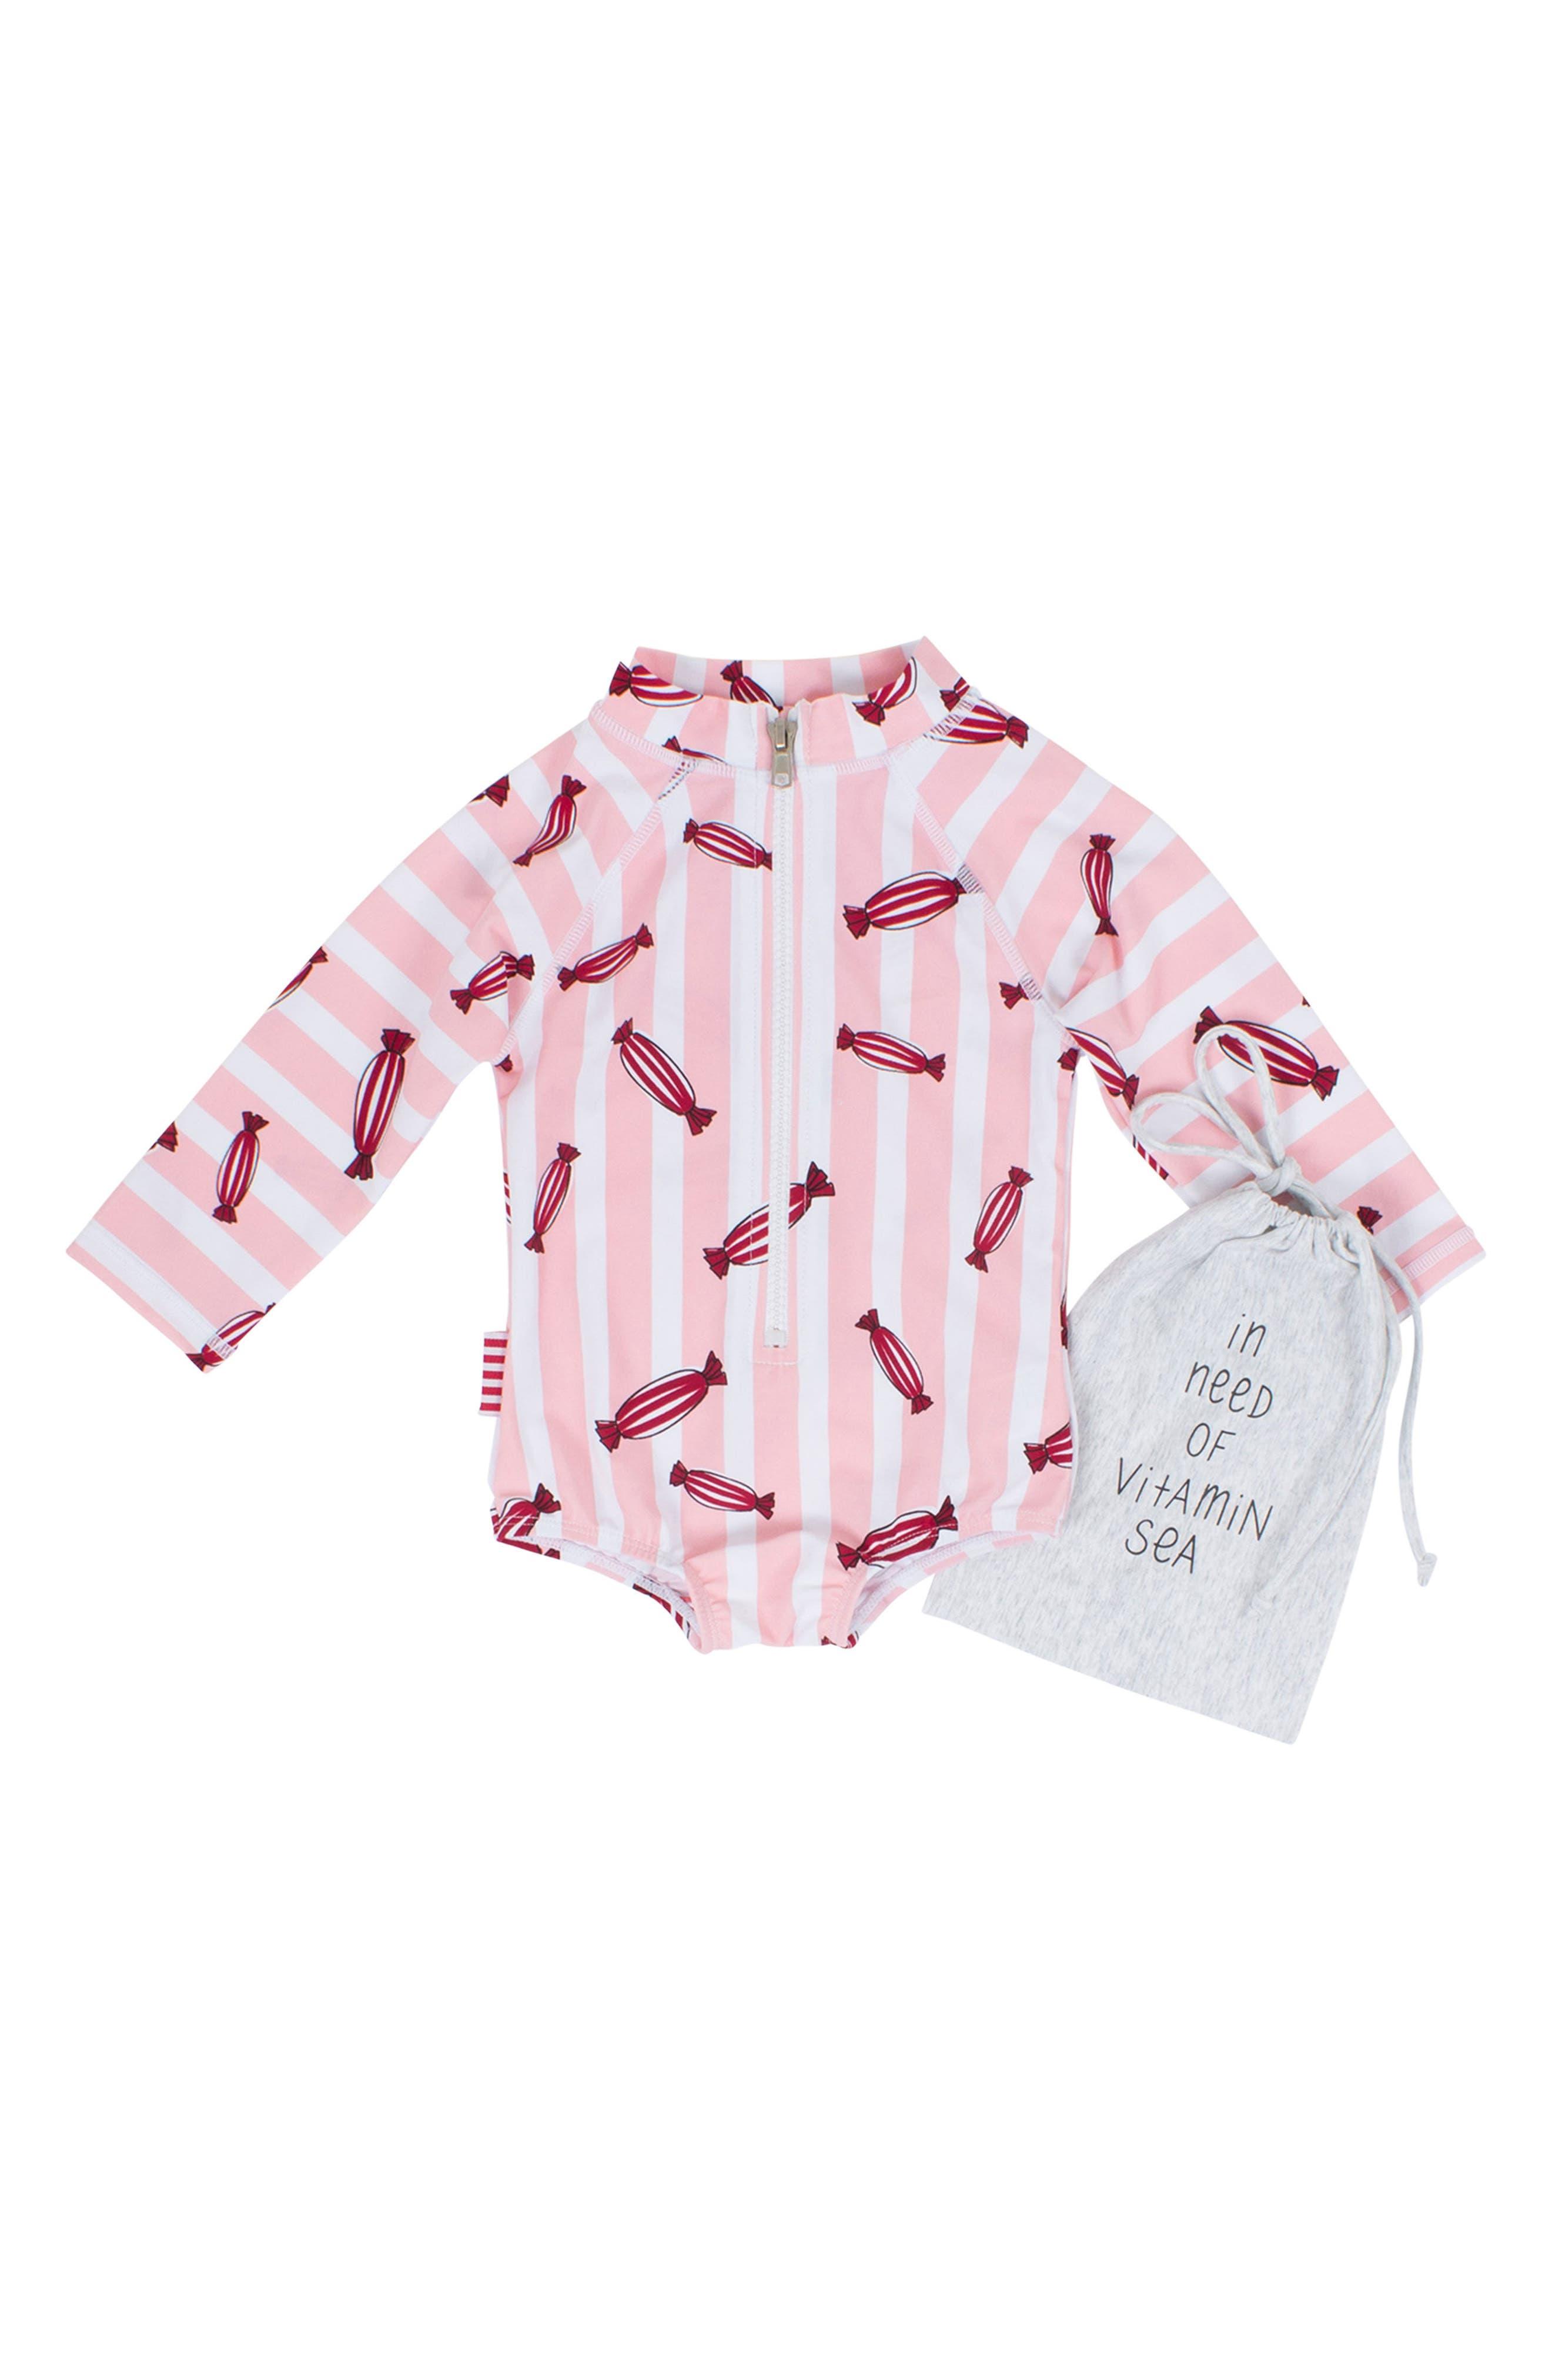 Bonbon One-Piece Rashguard Swimsuit,                         Main,                         color, Pink / Red